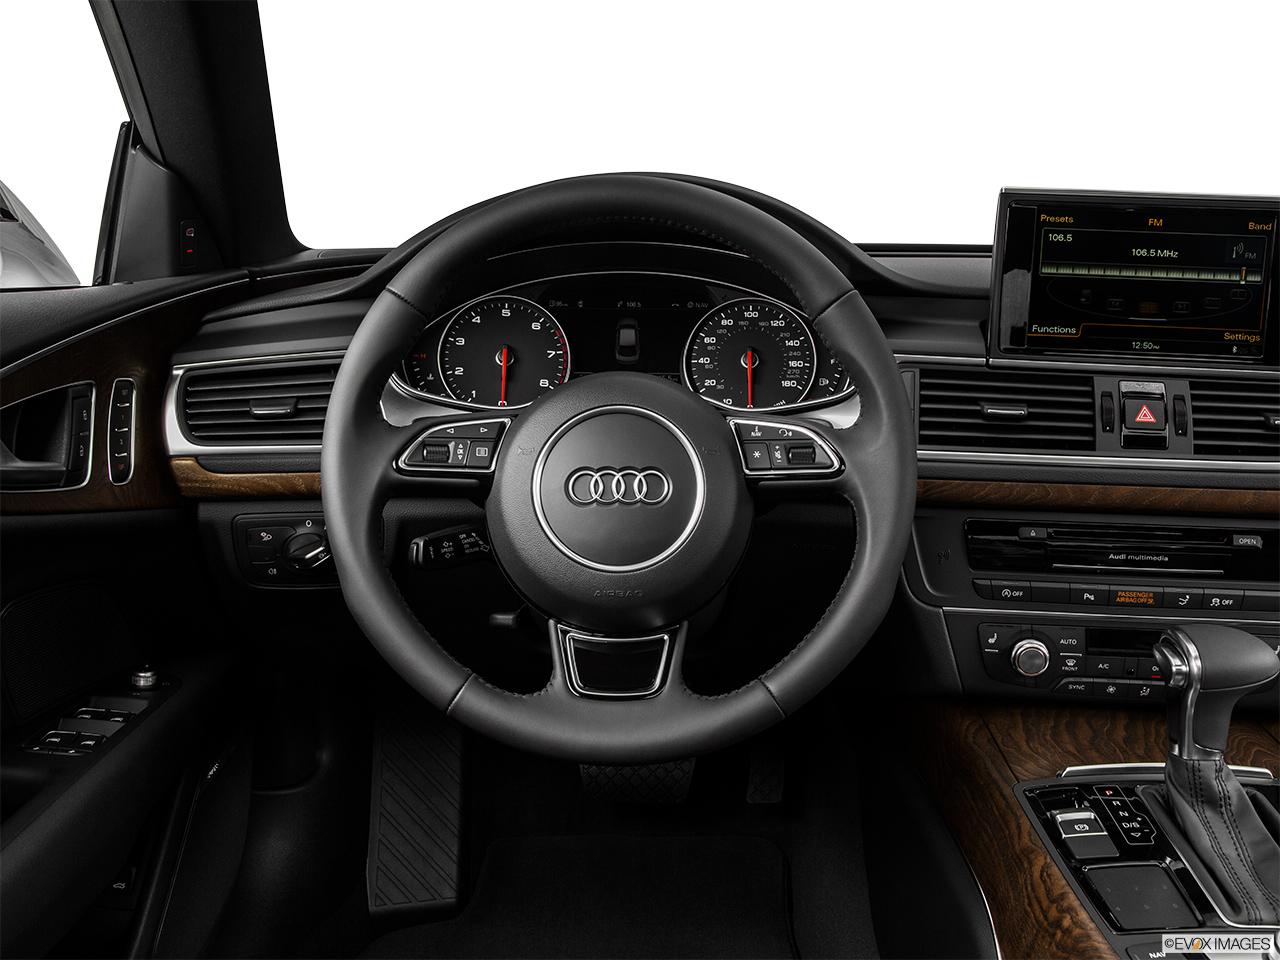 2015 audi a7 hatchback quattro 3 0 premium plus. Black Bedroom Furniture Sets. Home Design Ideas